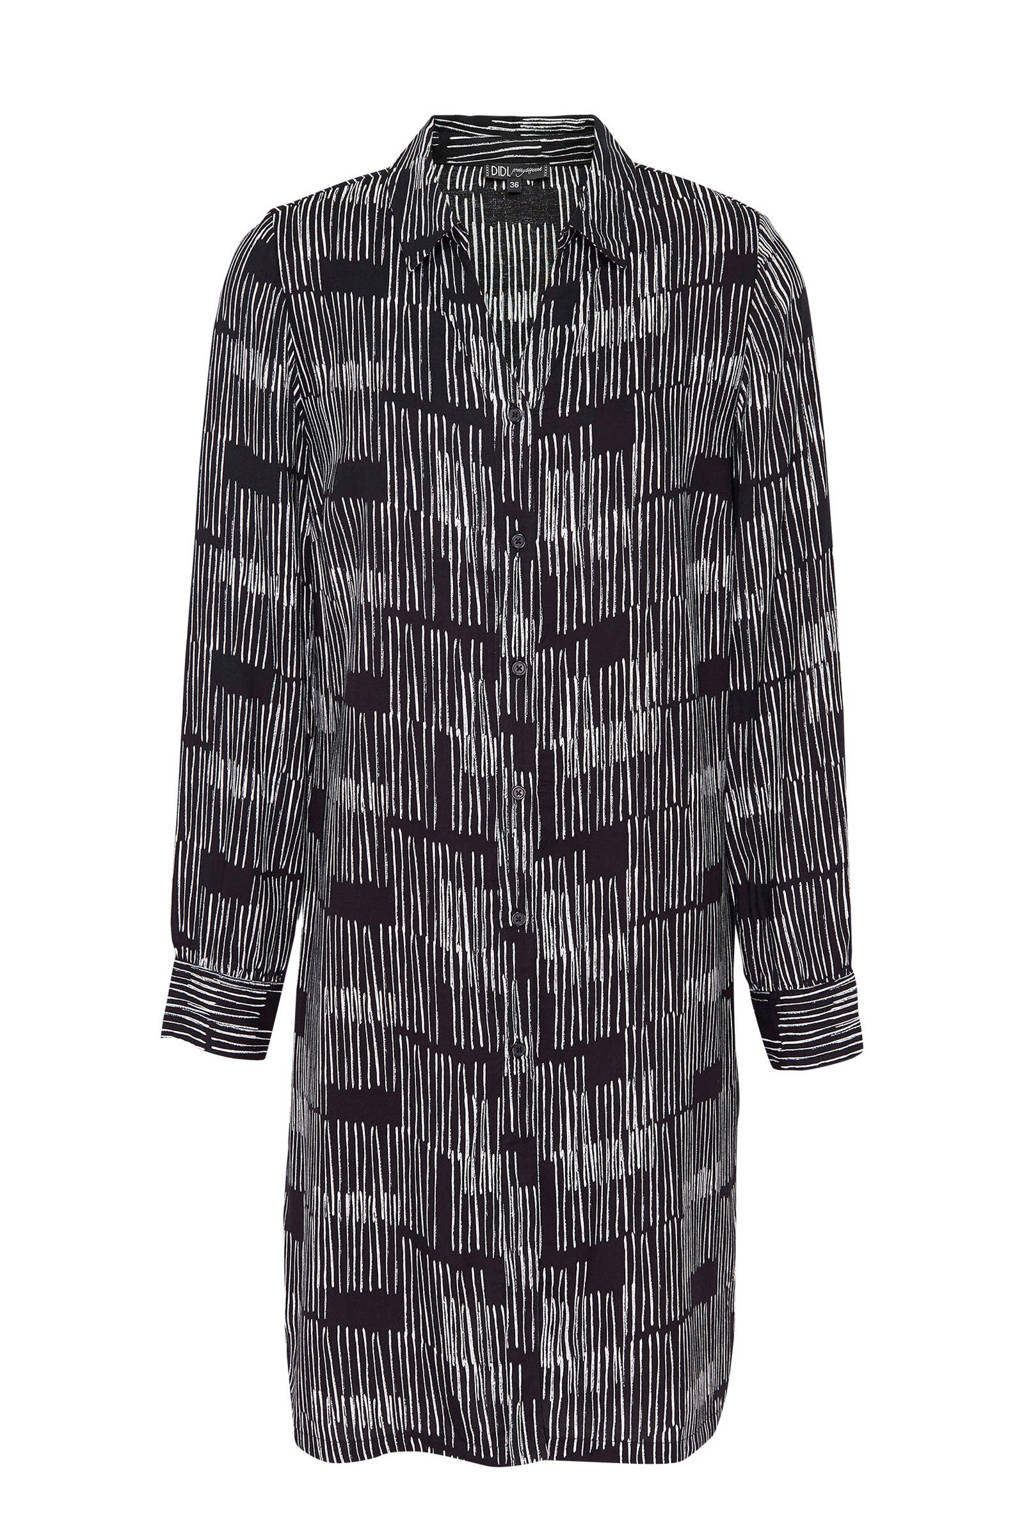 Didi blouse tuniek met all over print zwart, Zwart/ ecru